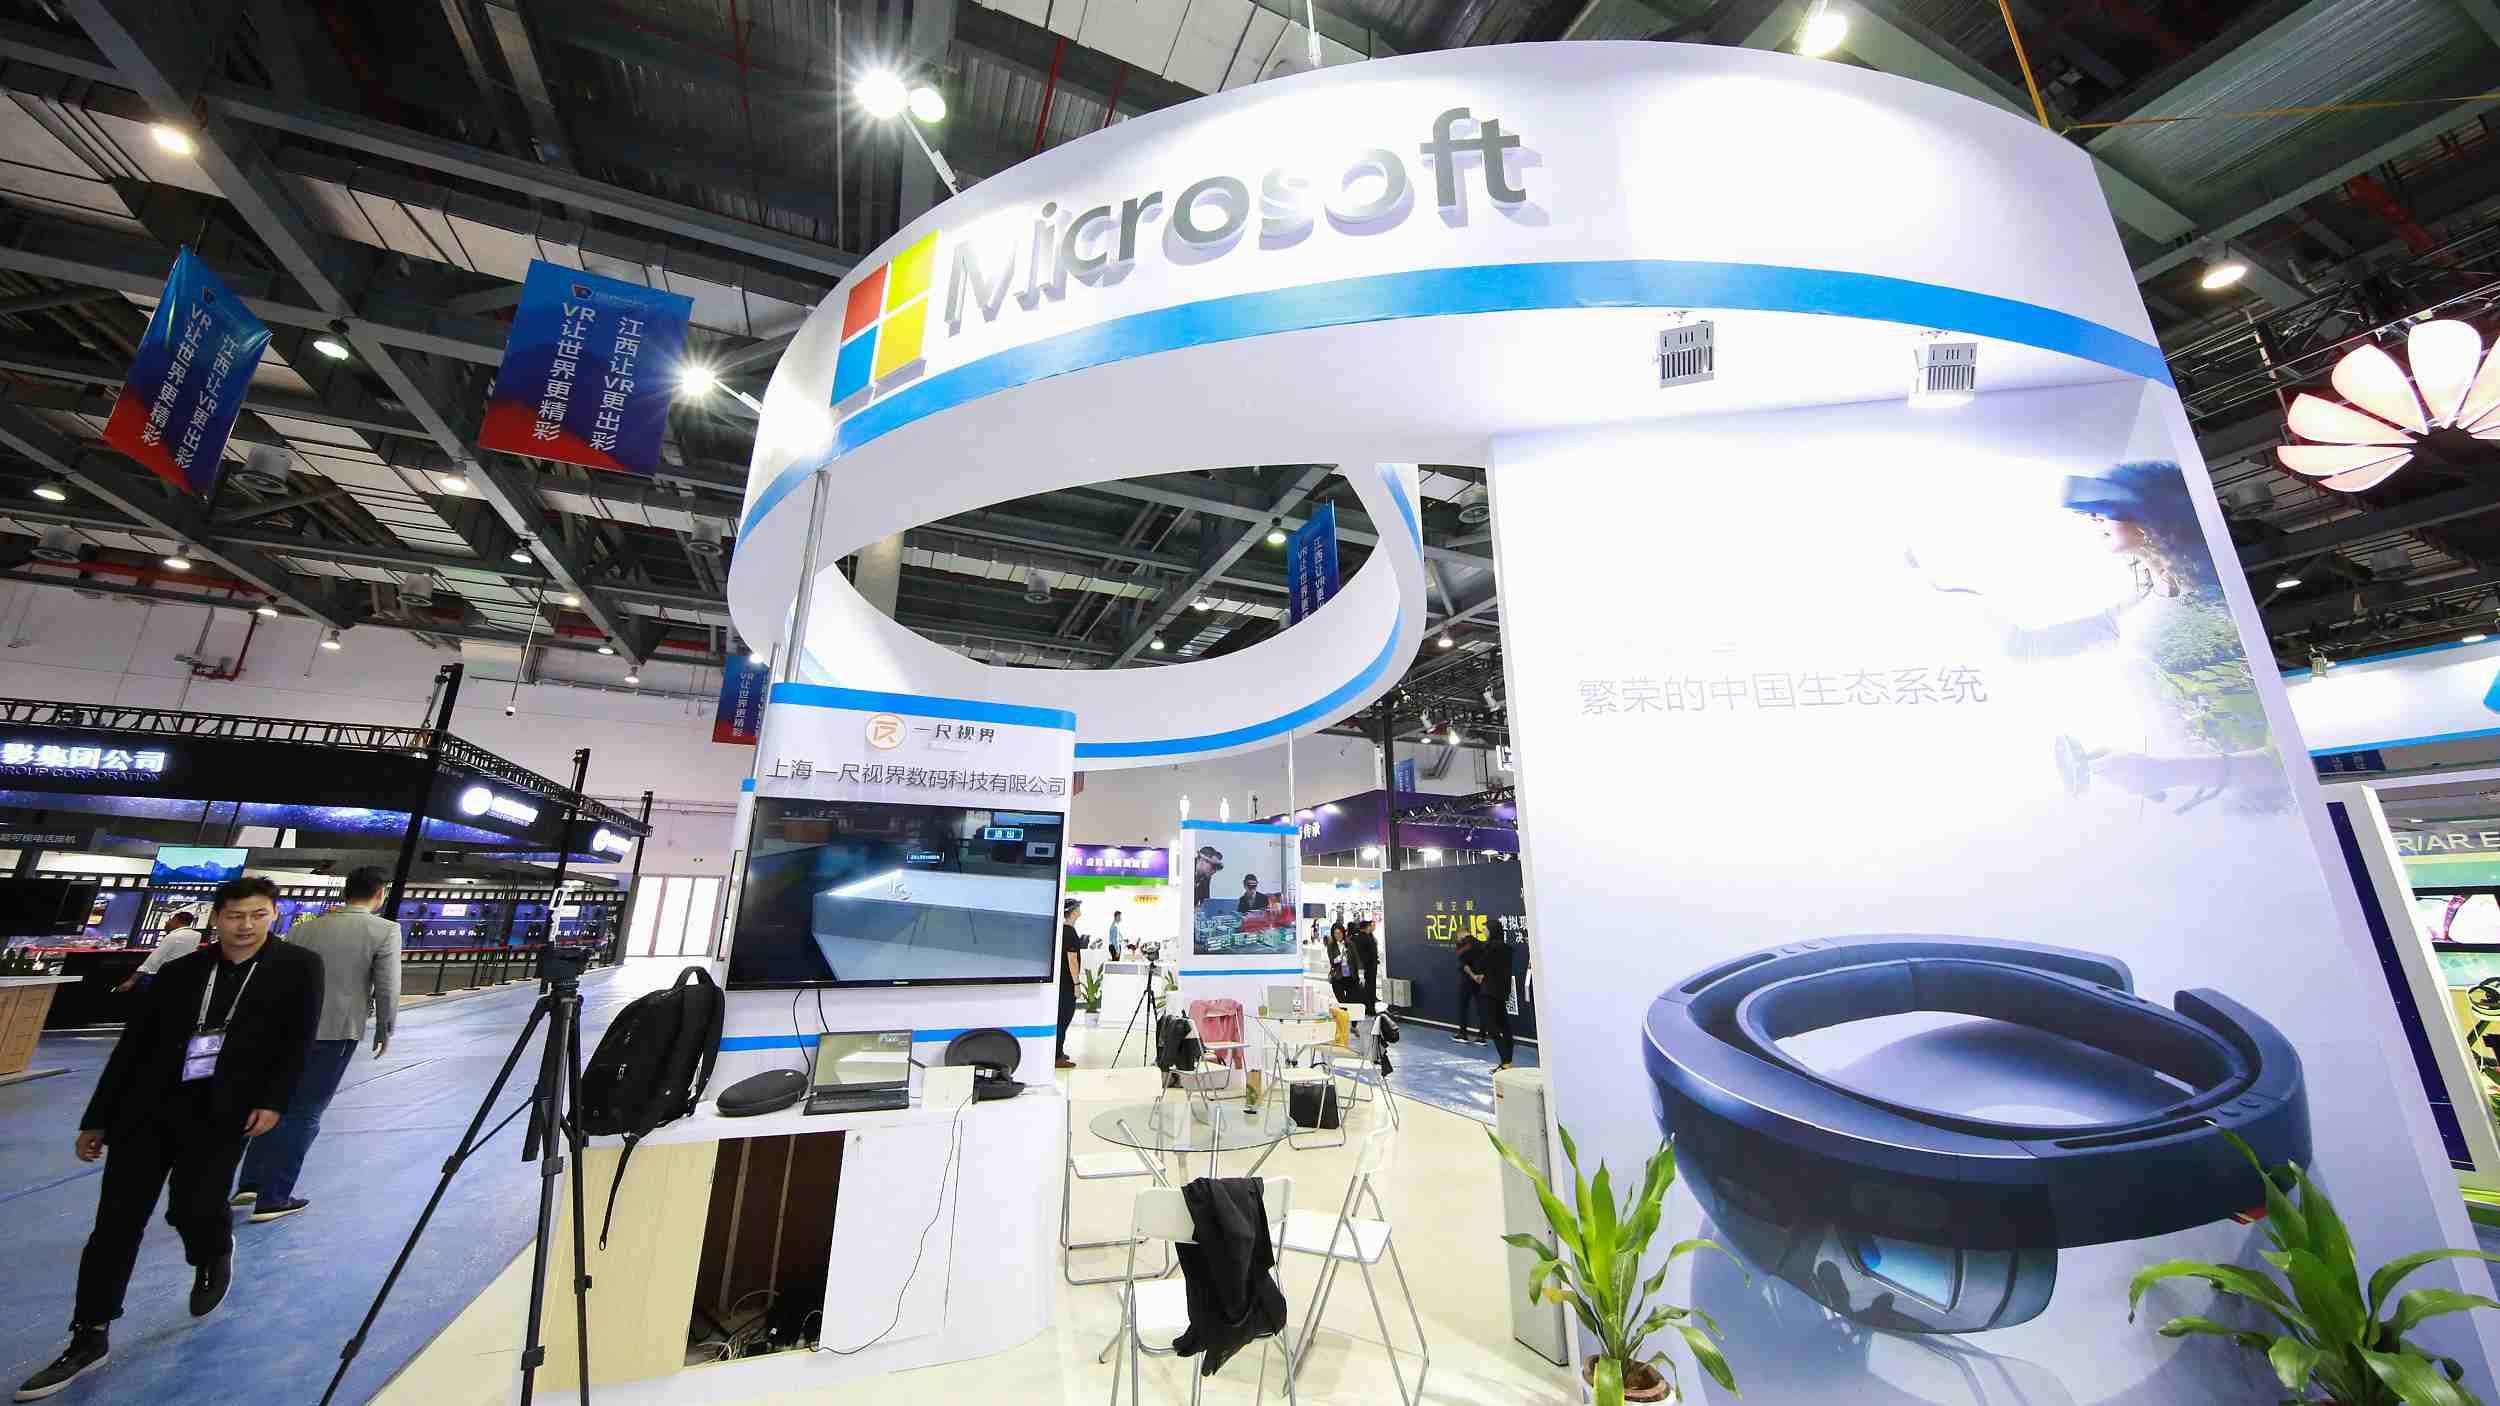 Microsoft locates first VR/MR incubator in China's Jiangxi